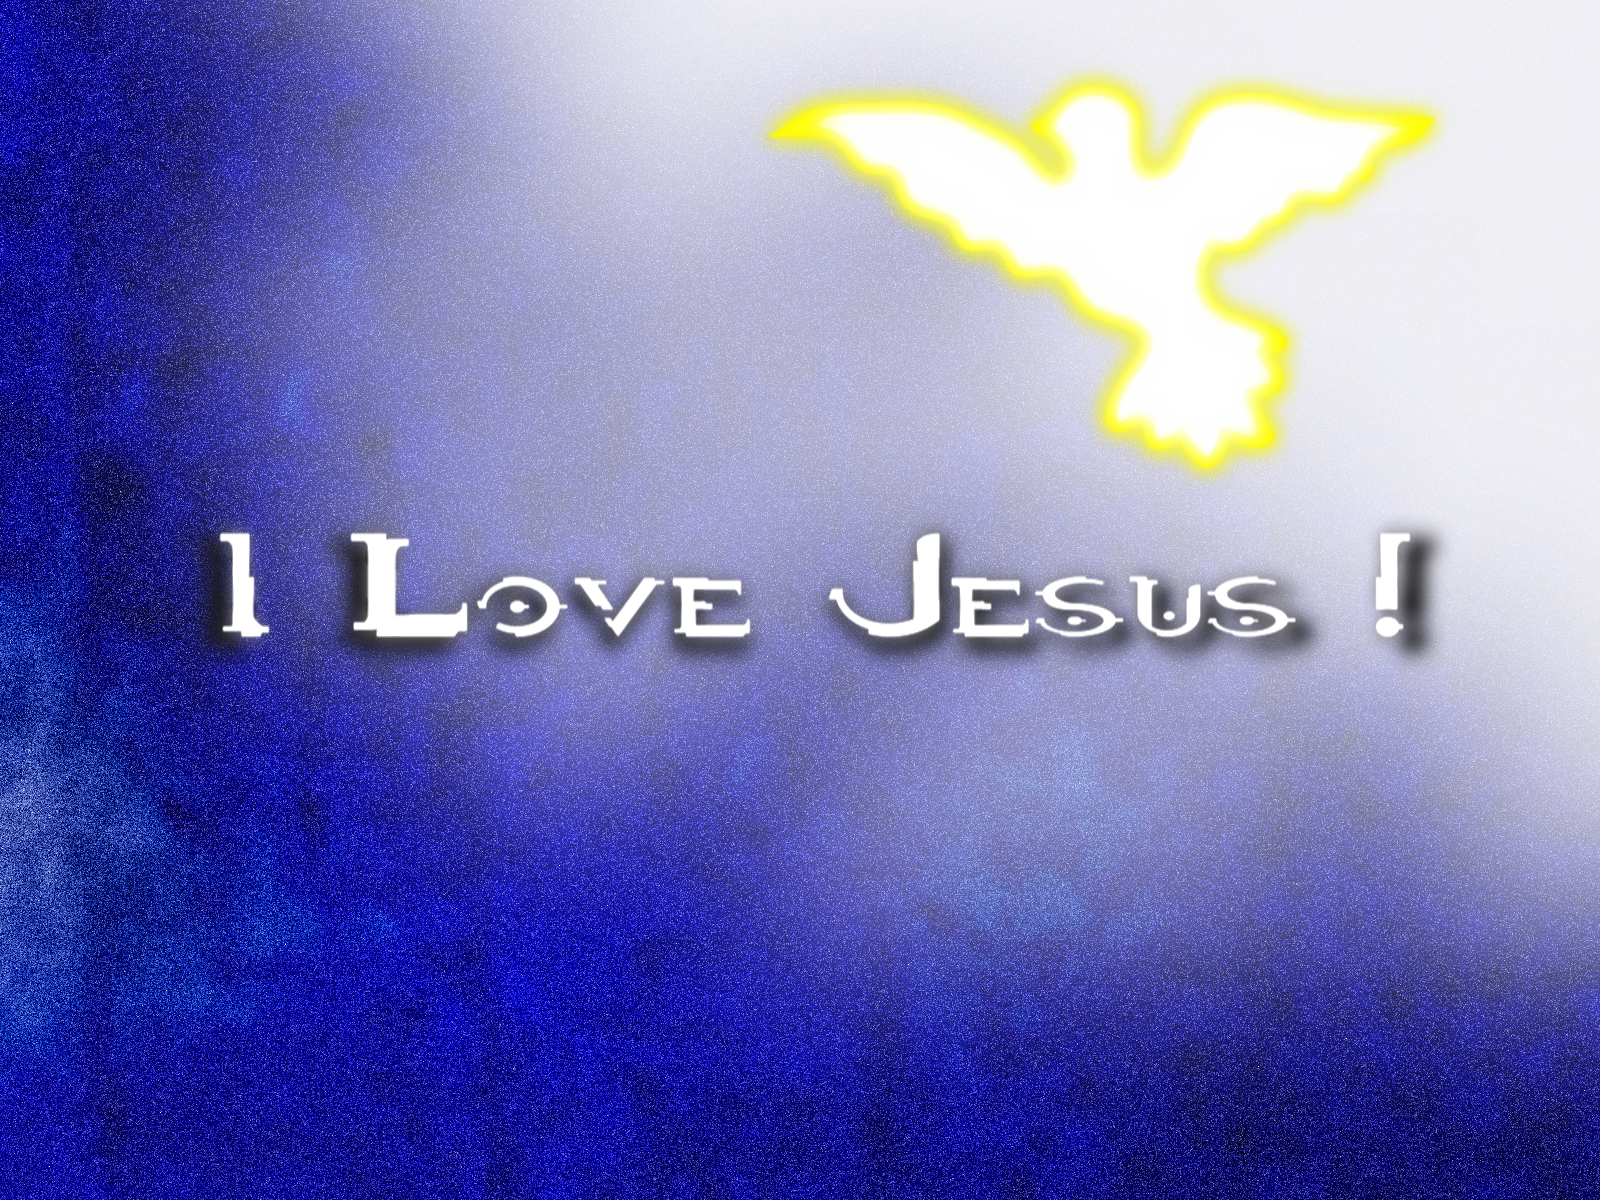 I Love Jesus Christ Wallpaper